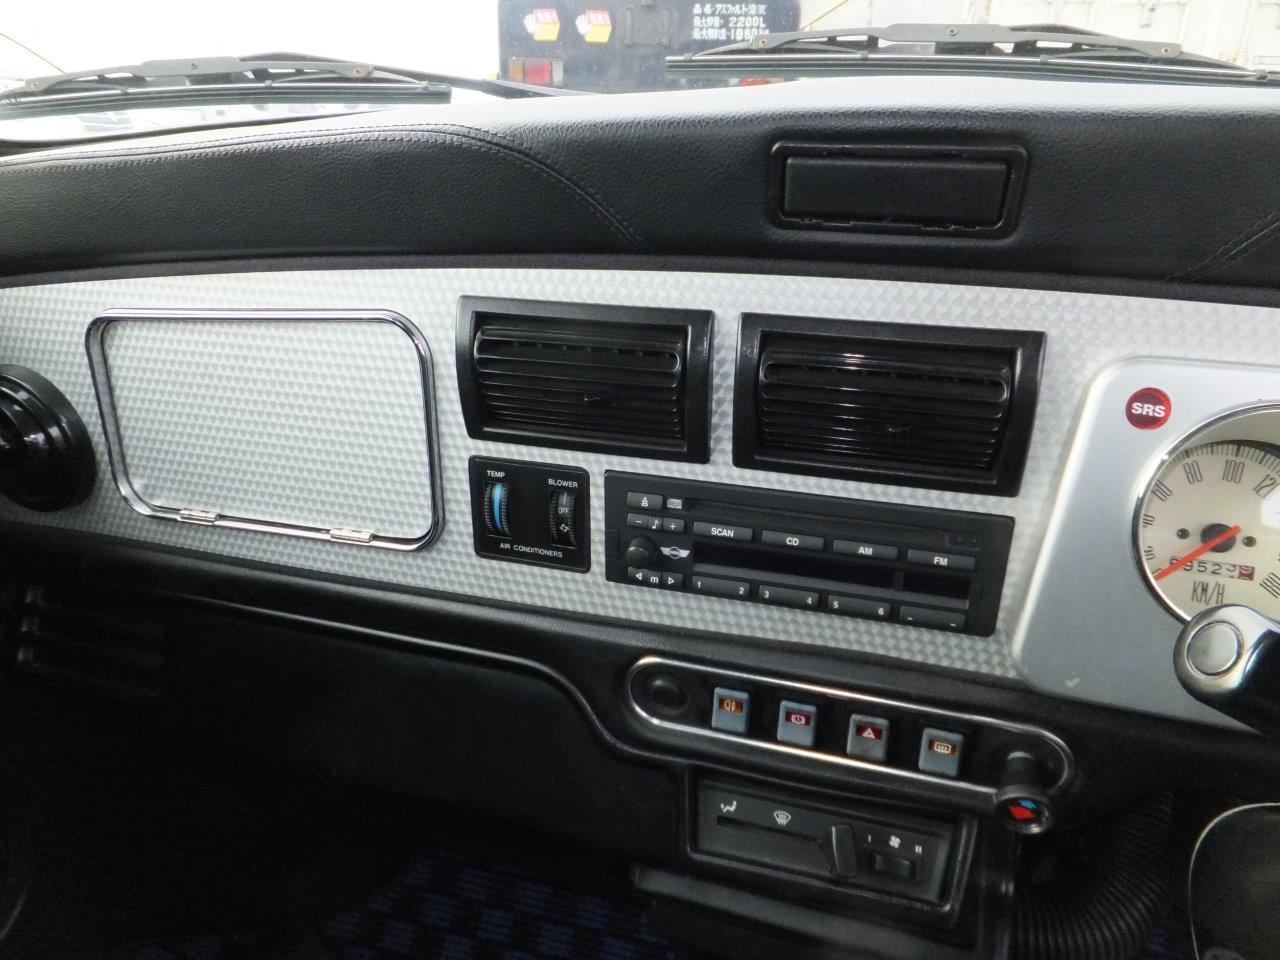 What Is The Best Engine Oil For Mini Cooper S >> 1998 Rover Mini Cooper BSCC LTD - Prestige Motorsport